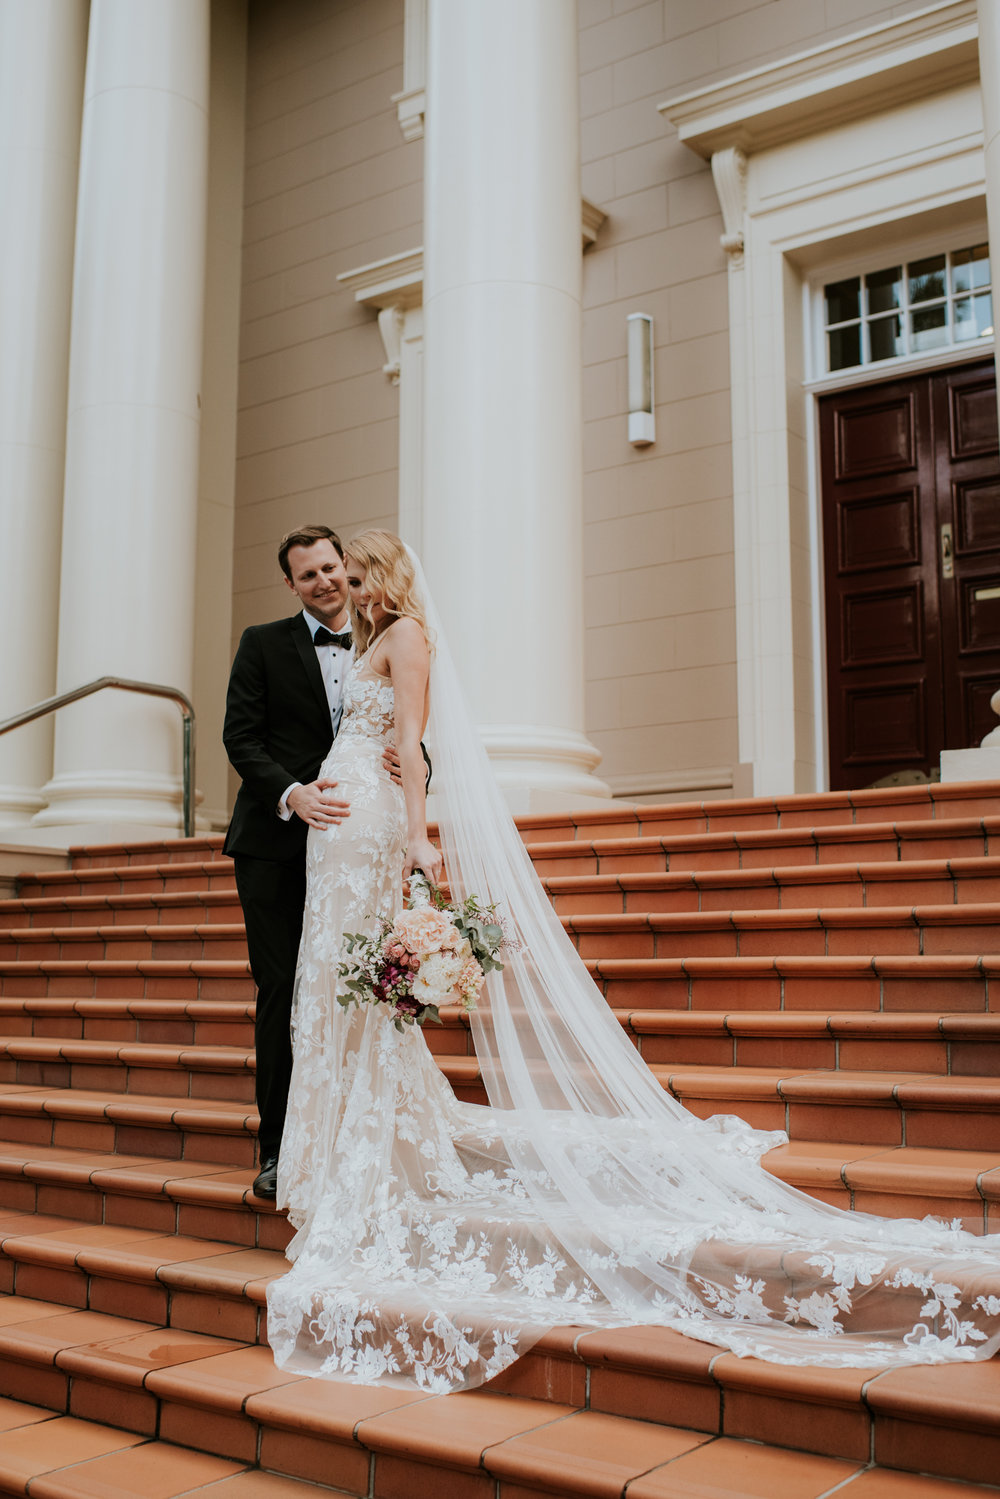 Brisbane Wedding Photographer | Engagement-Elopement Photography | Factory51-City Botantic Gardens Wedding-66.jpg